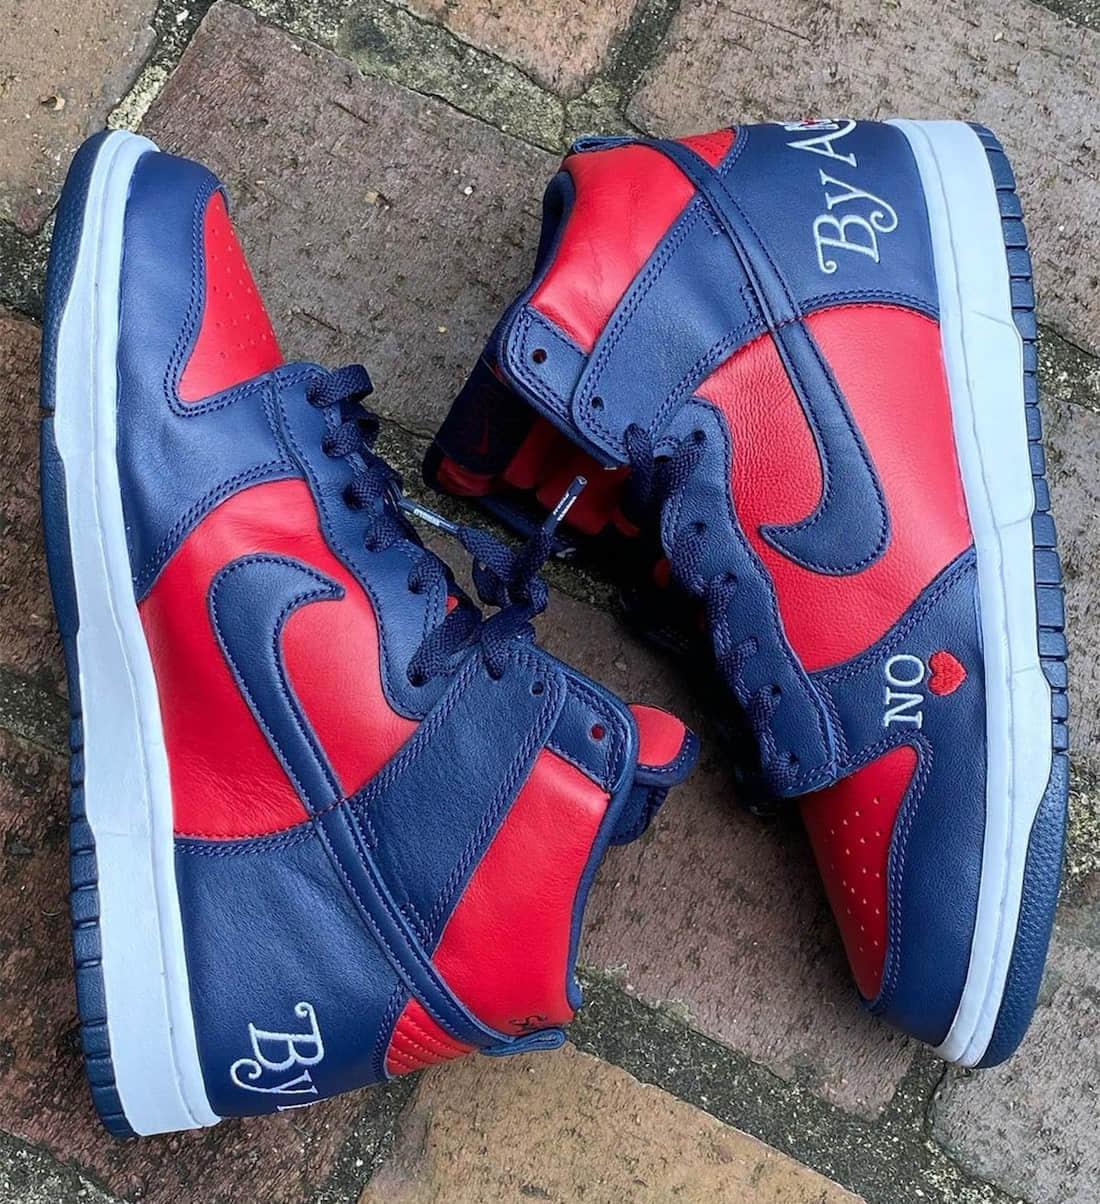 Supreme x Nike SB Dunk第二款配色曝光!红蓝撞色有点抢眼!